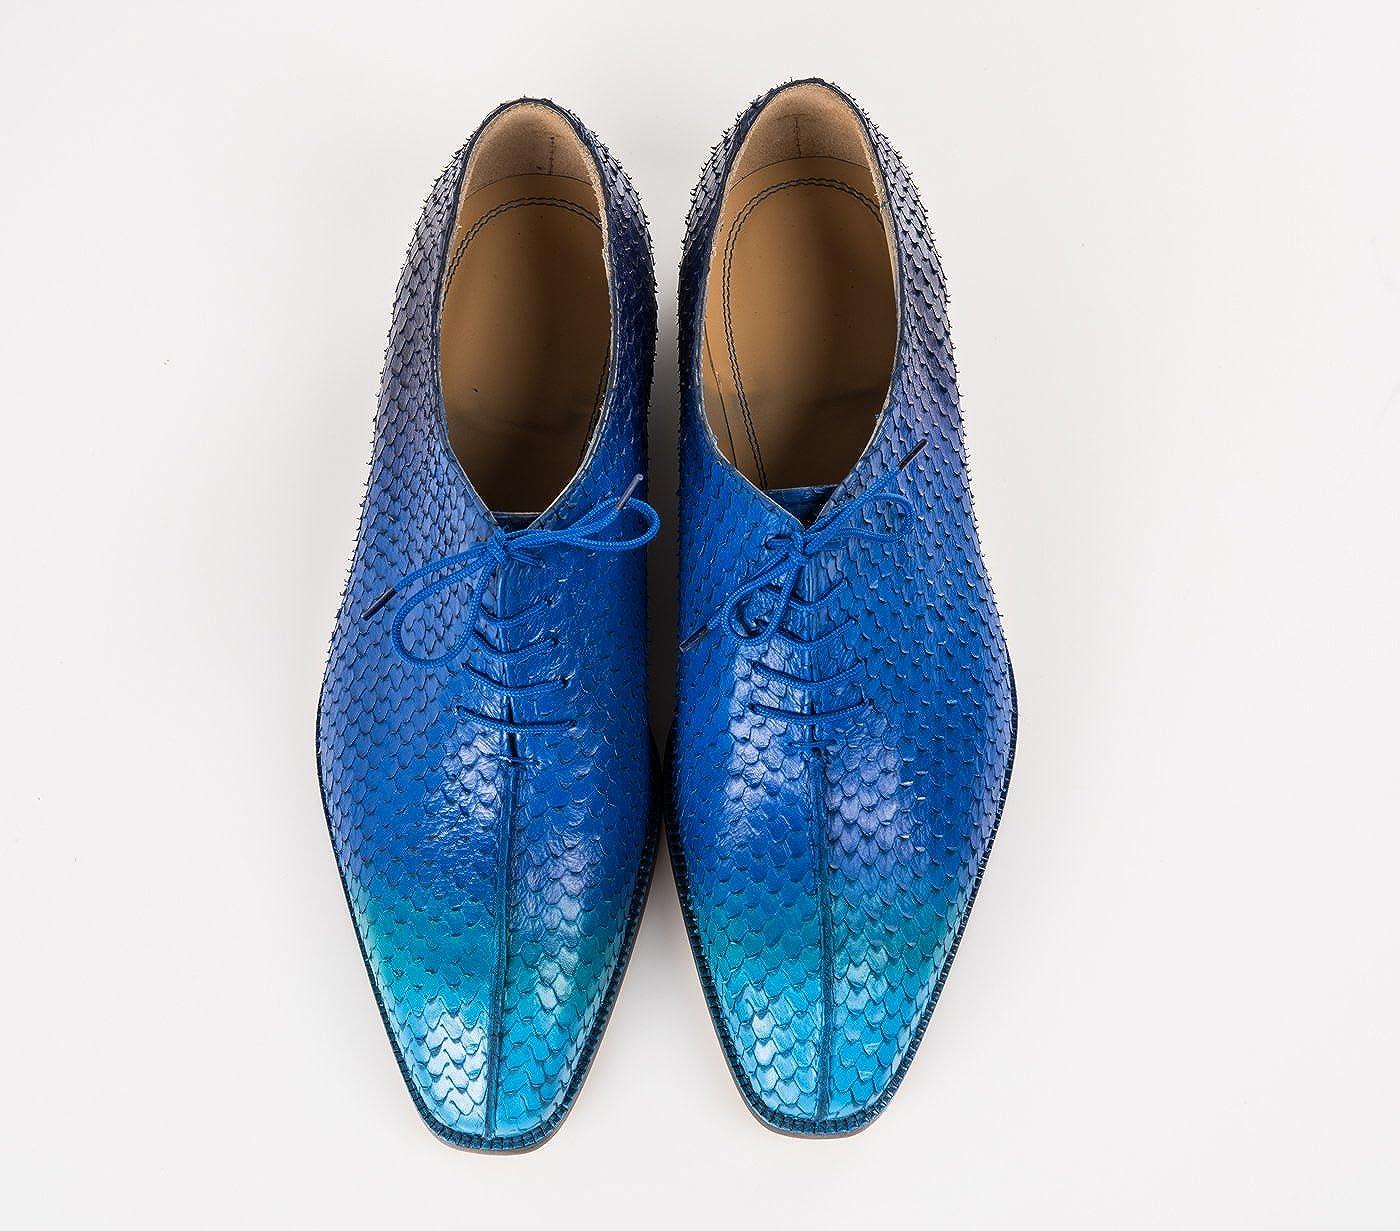 Nedelcu Schuhwerkstadt Herrenschuhe Herren Schnürhalbschuhe Elegant Elegant Elegant Businessschuhe Lederschuhe Hochzeit Schuhe, Handgefertigte Schuhe Oxford 2 Face Painted c4f6f3